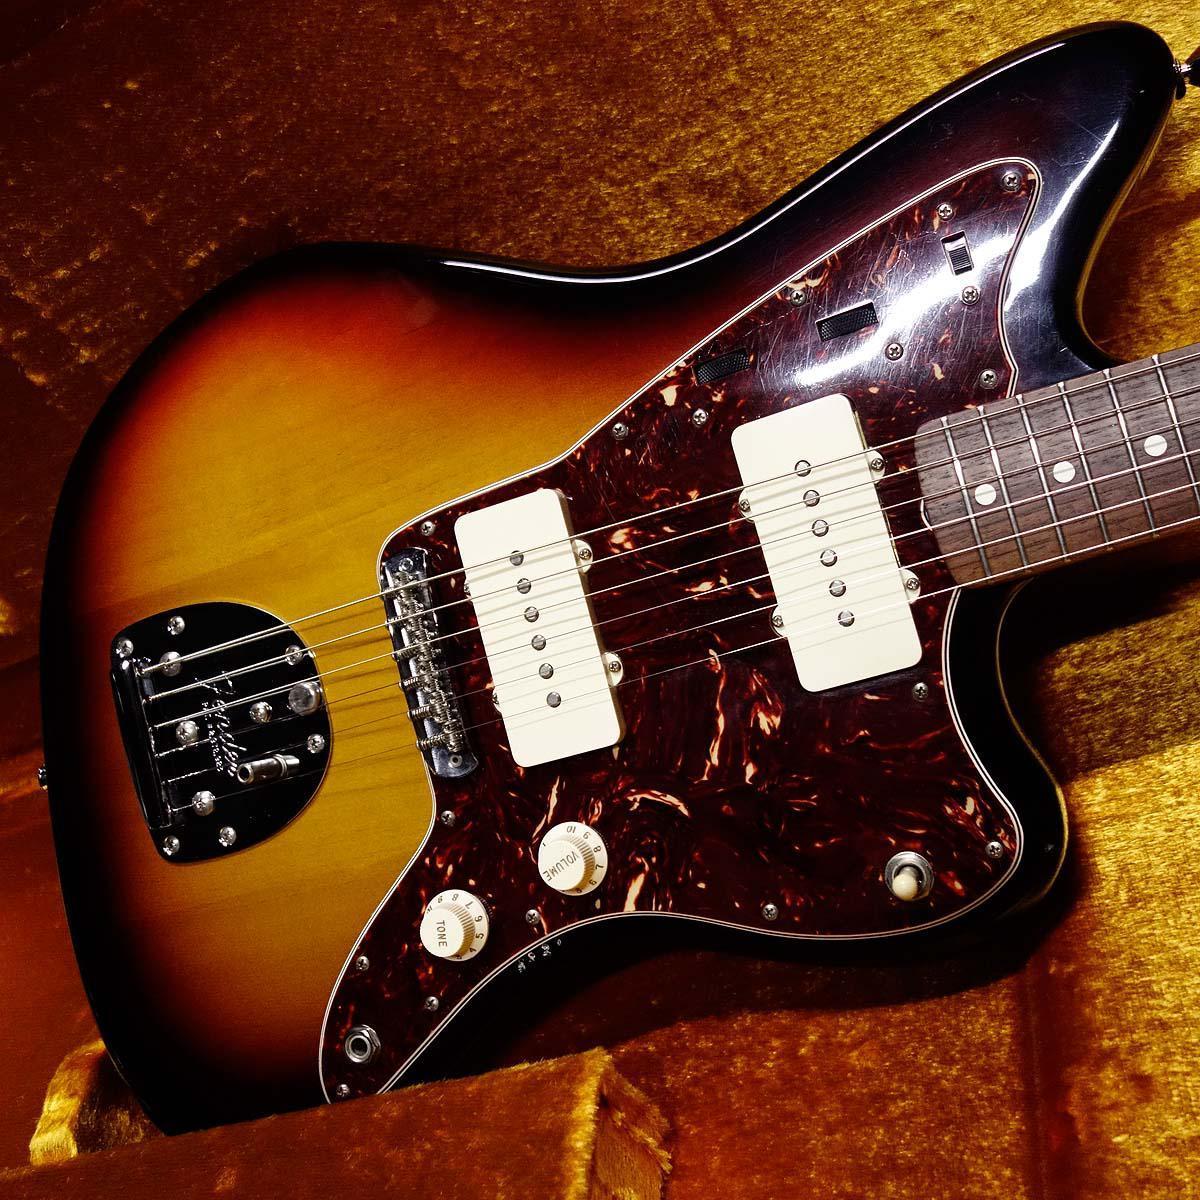 Fender AmericanVintageseries 62Jazzmaster 3-Colorsunburst [Kariya shop]